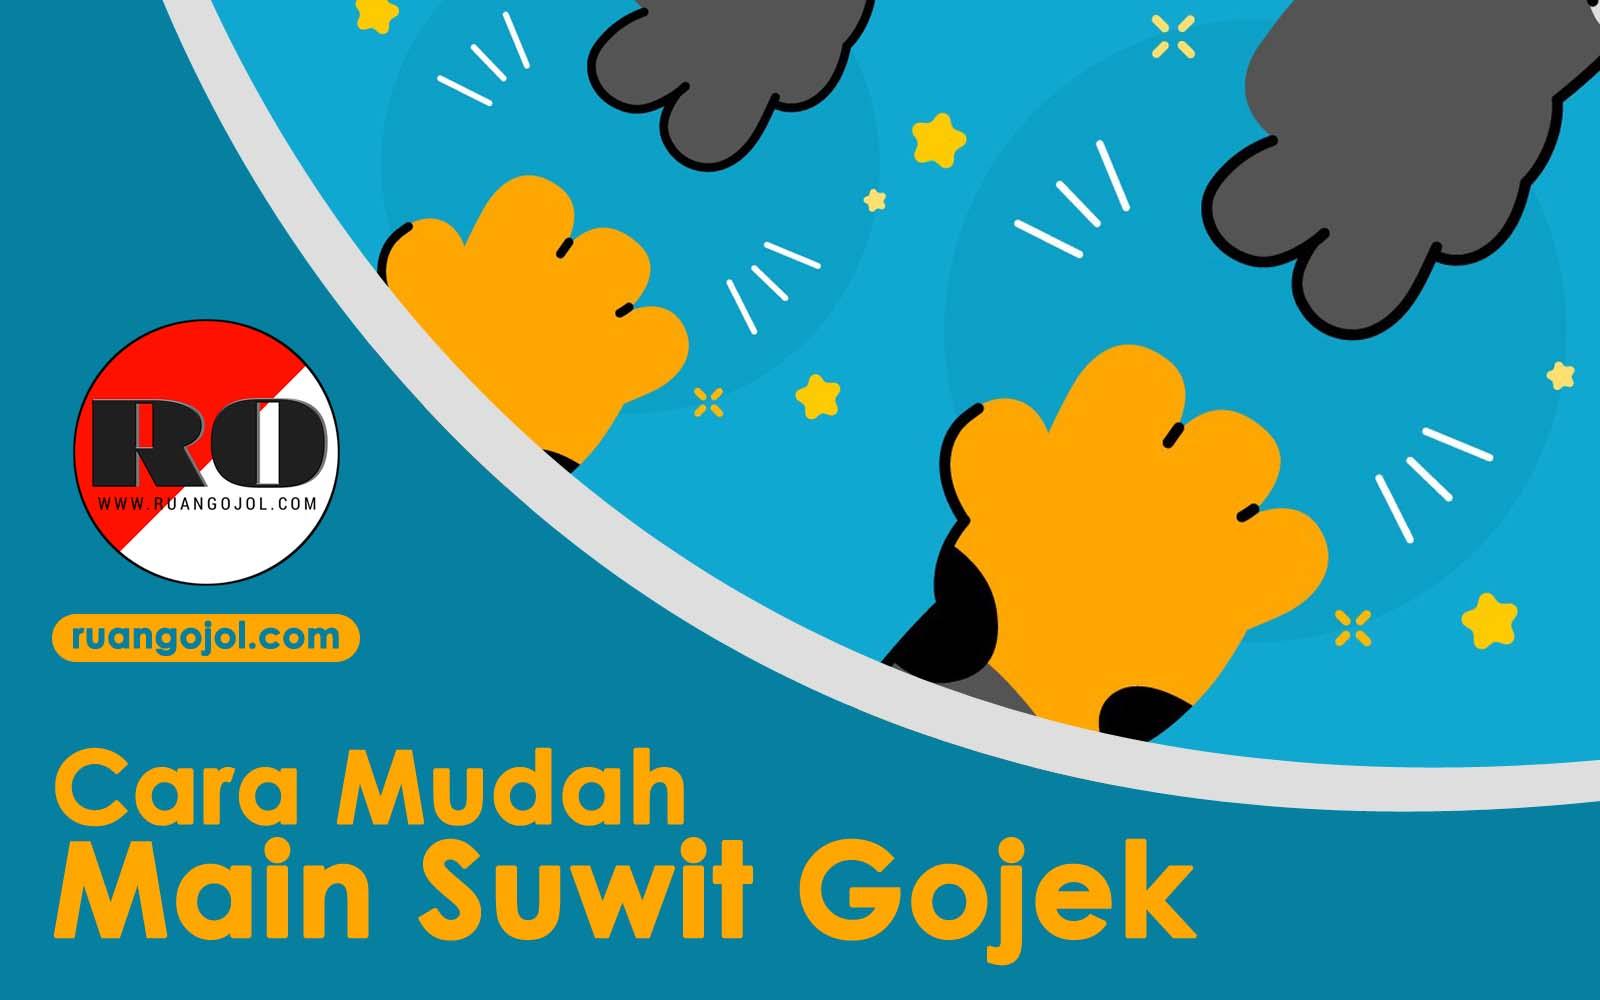 11 Cara Main Suwit Gojek untuk Dapat Saldo GoPay Gratis